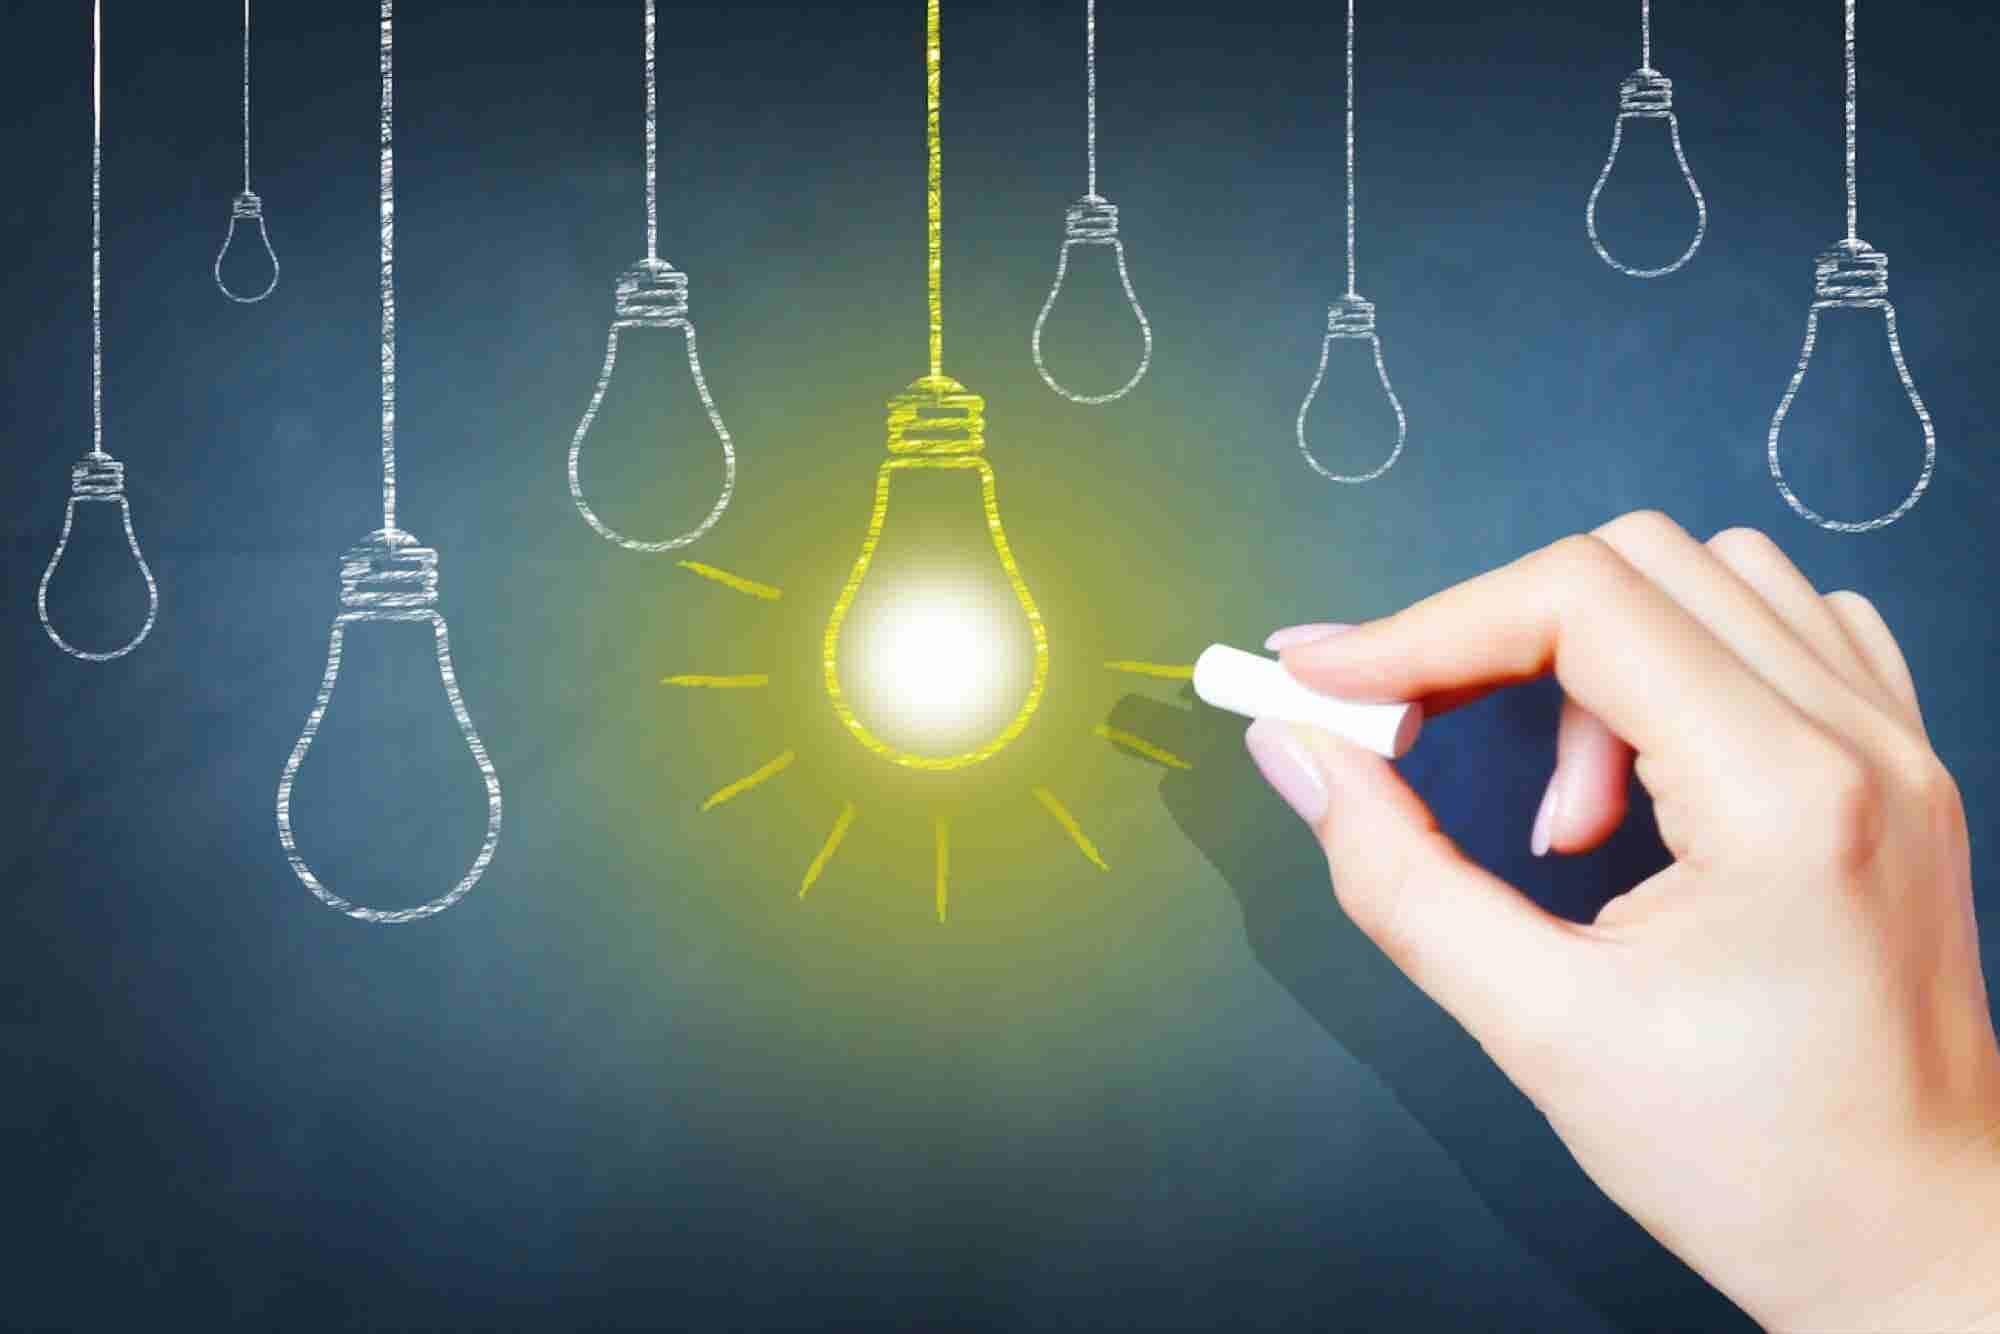 Myths About Entrepreneurship: Enterprise Go-Getters Don't Ascribe To Platitudes